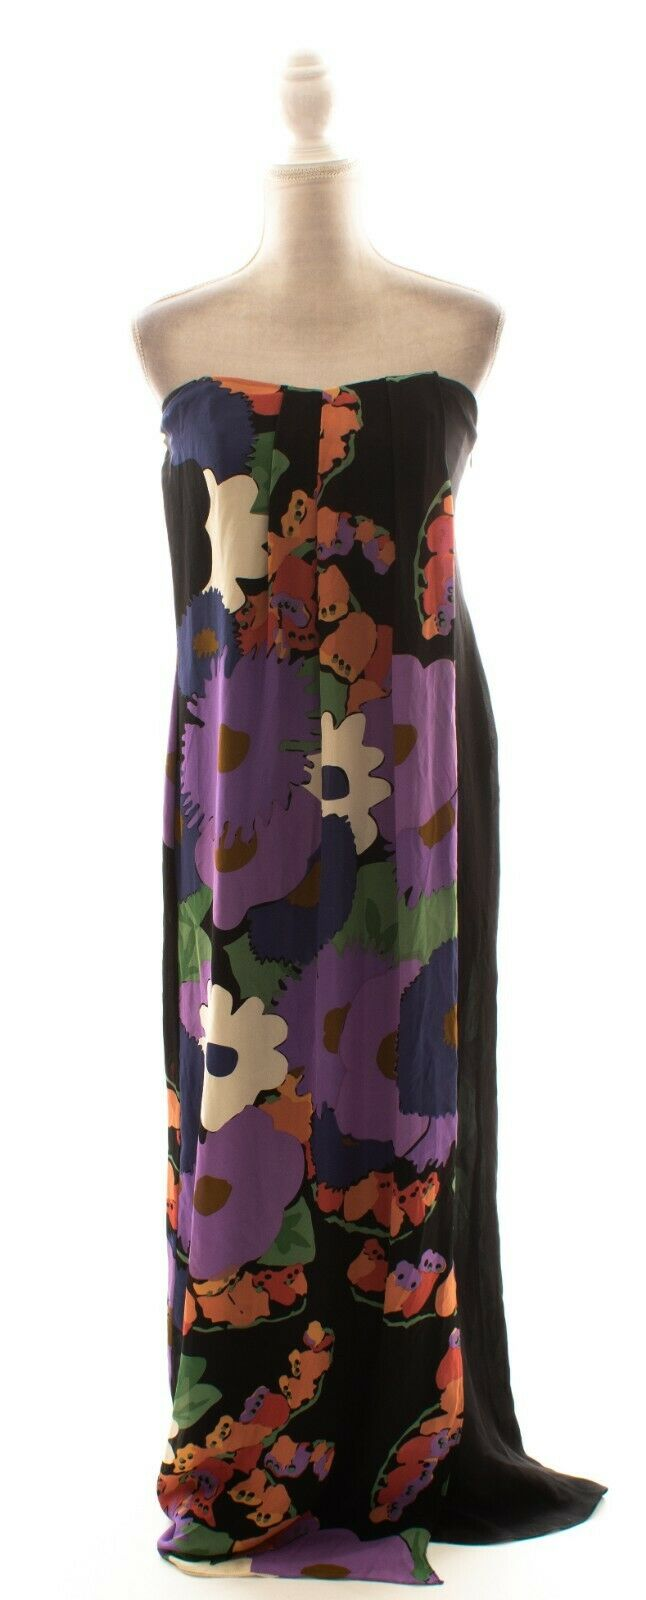 Tibi 100% Silk Floral Strapless Maxi Dress Größe 6